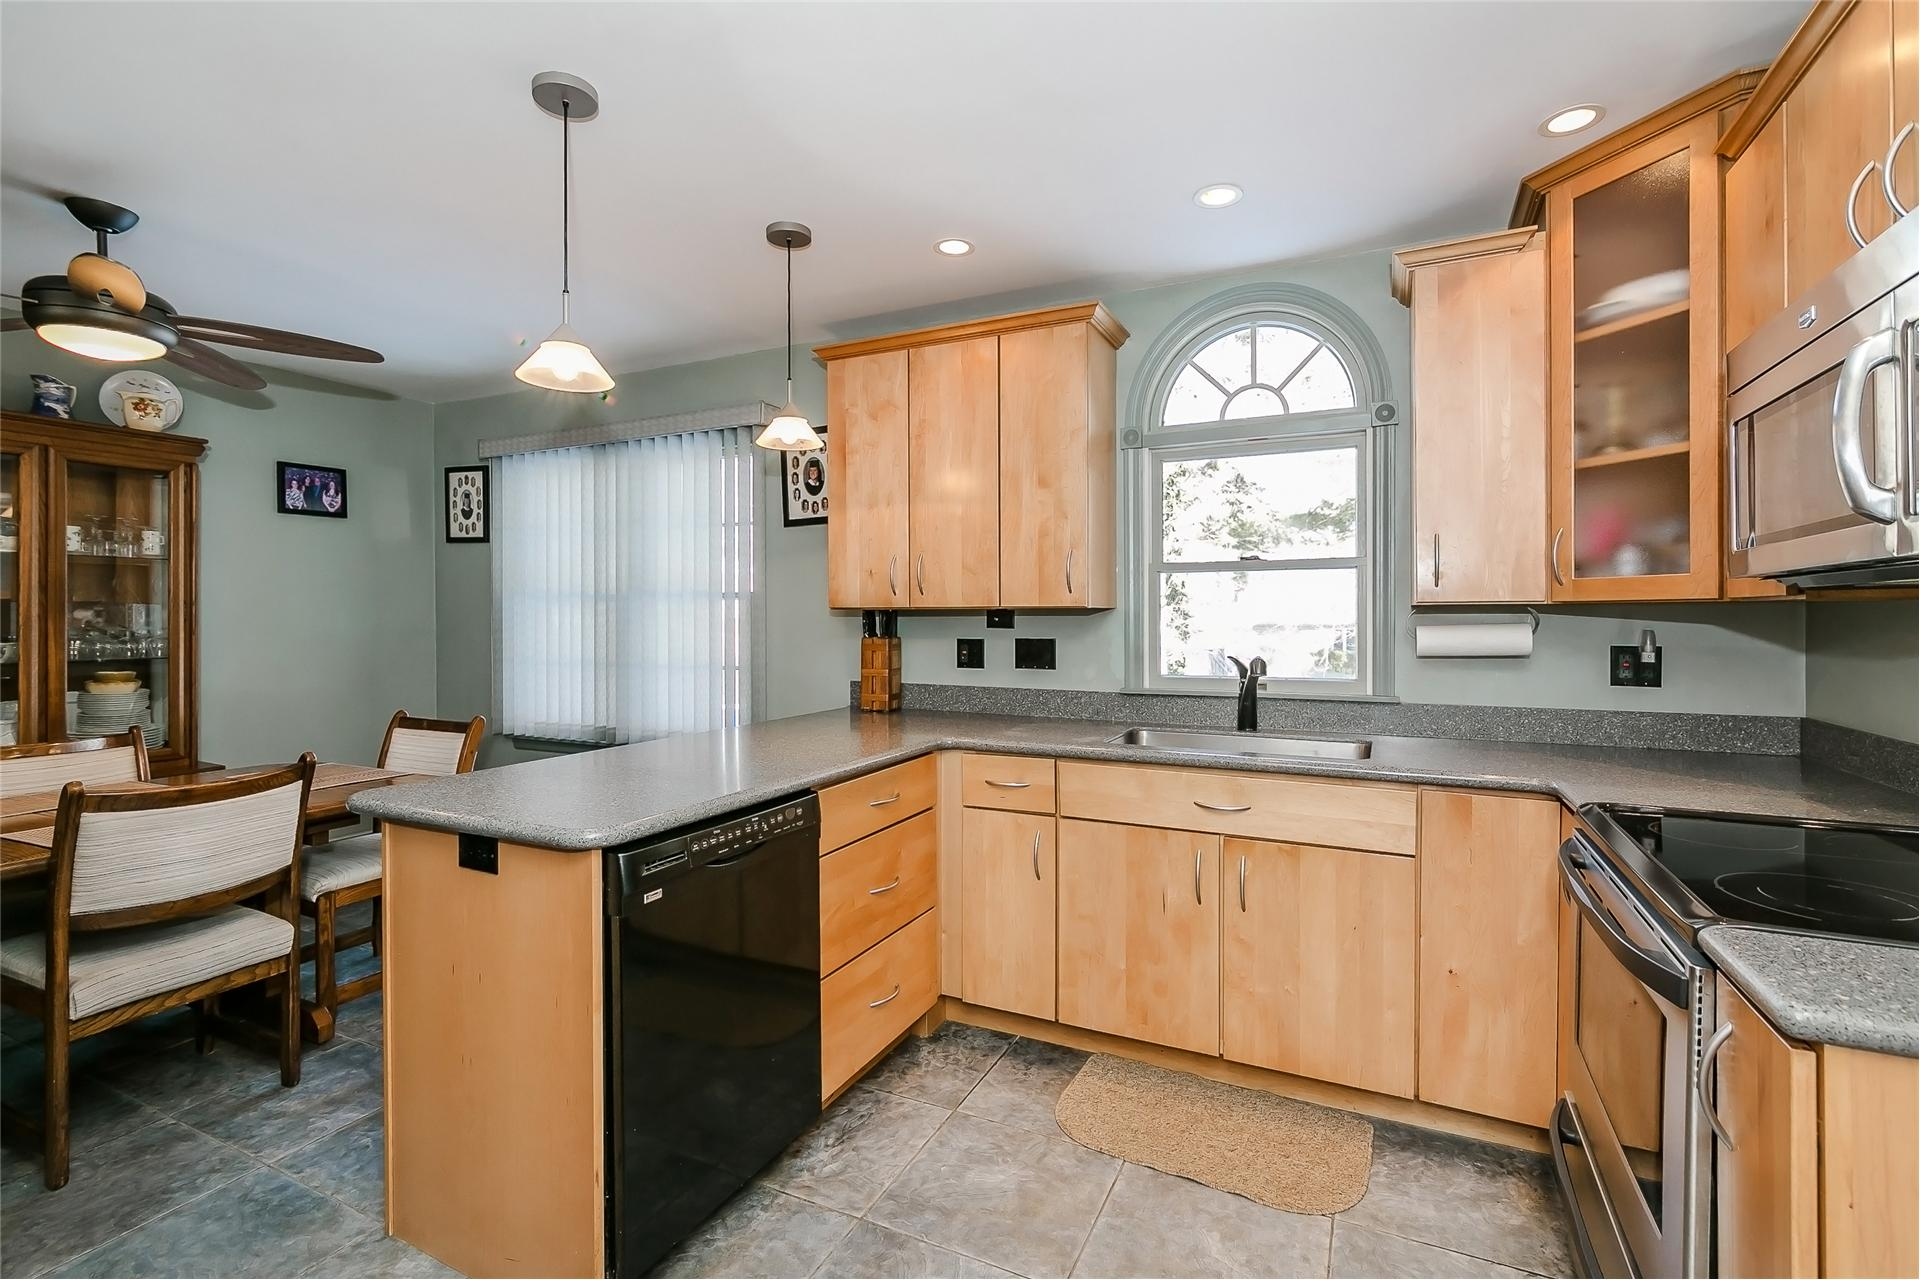 Single Family for Sale at 9 Park Ave Lake Ronkonkoma, New York 11779 United States